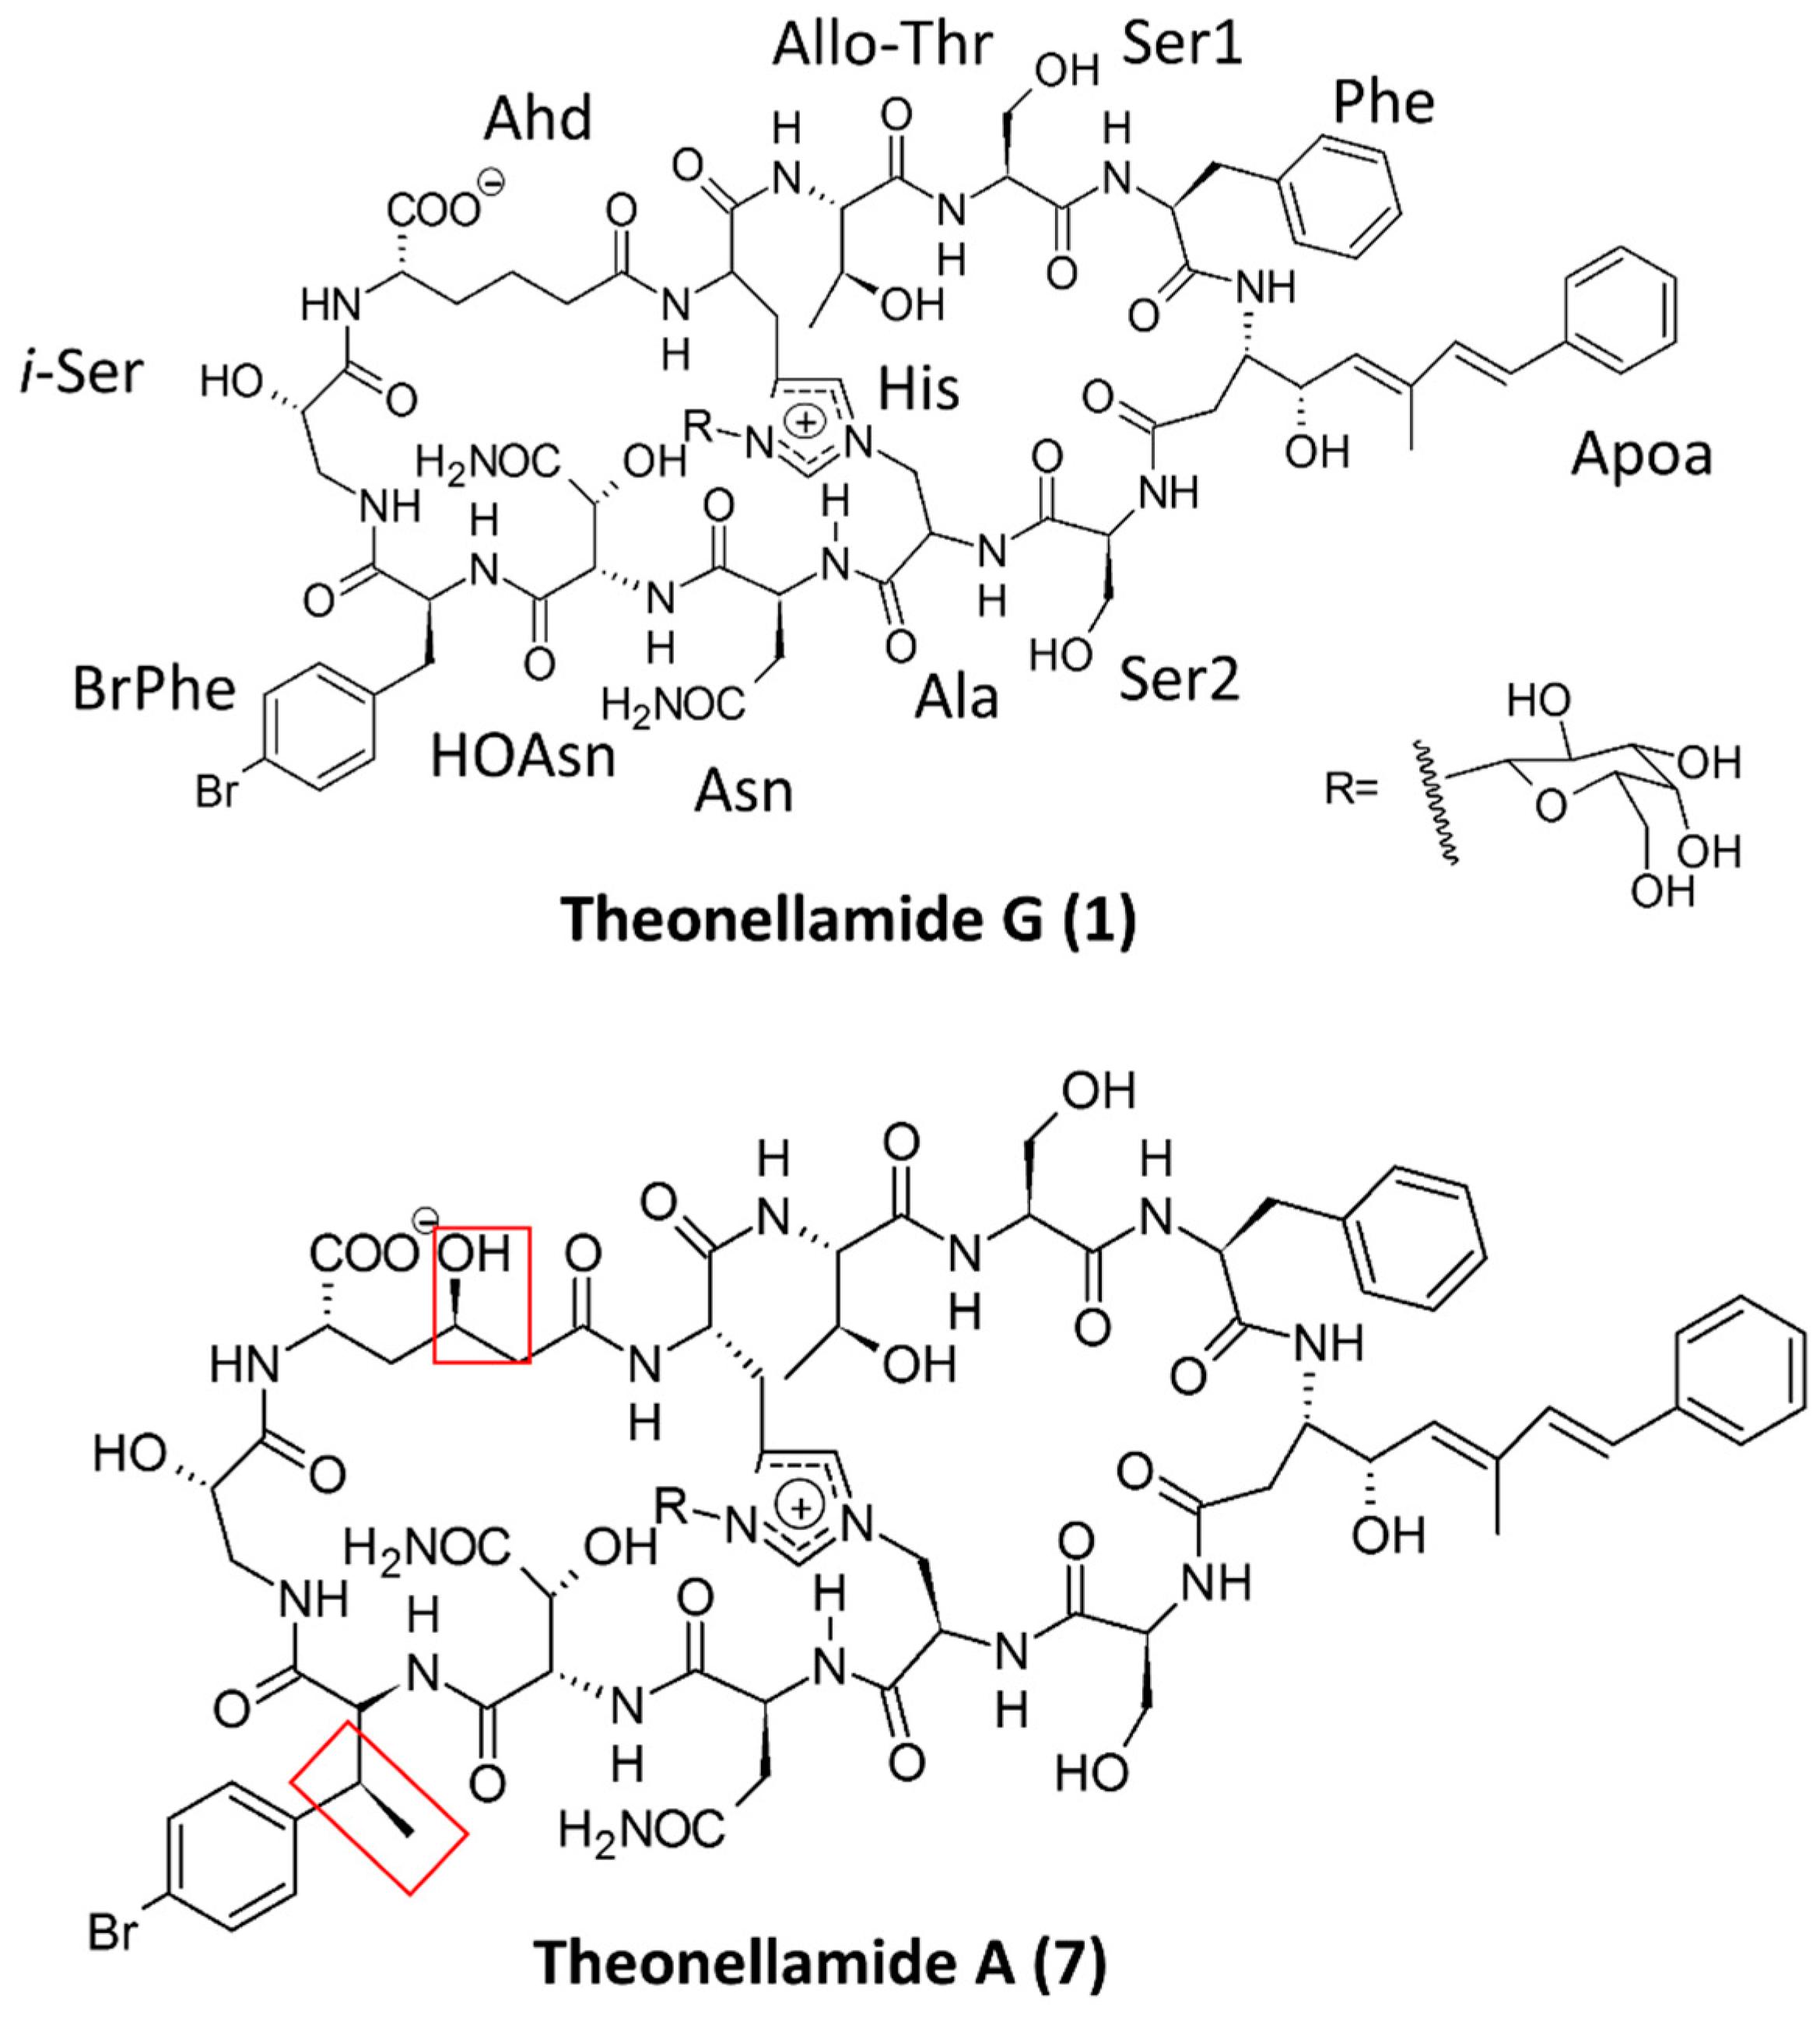 marine drugs free full text peptides peptidomimetics and Ford Bronco marinedrugs 15 00124 g006